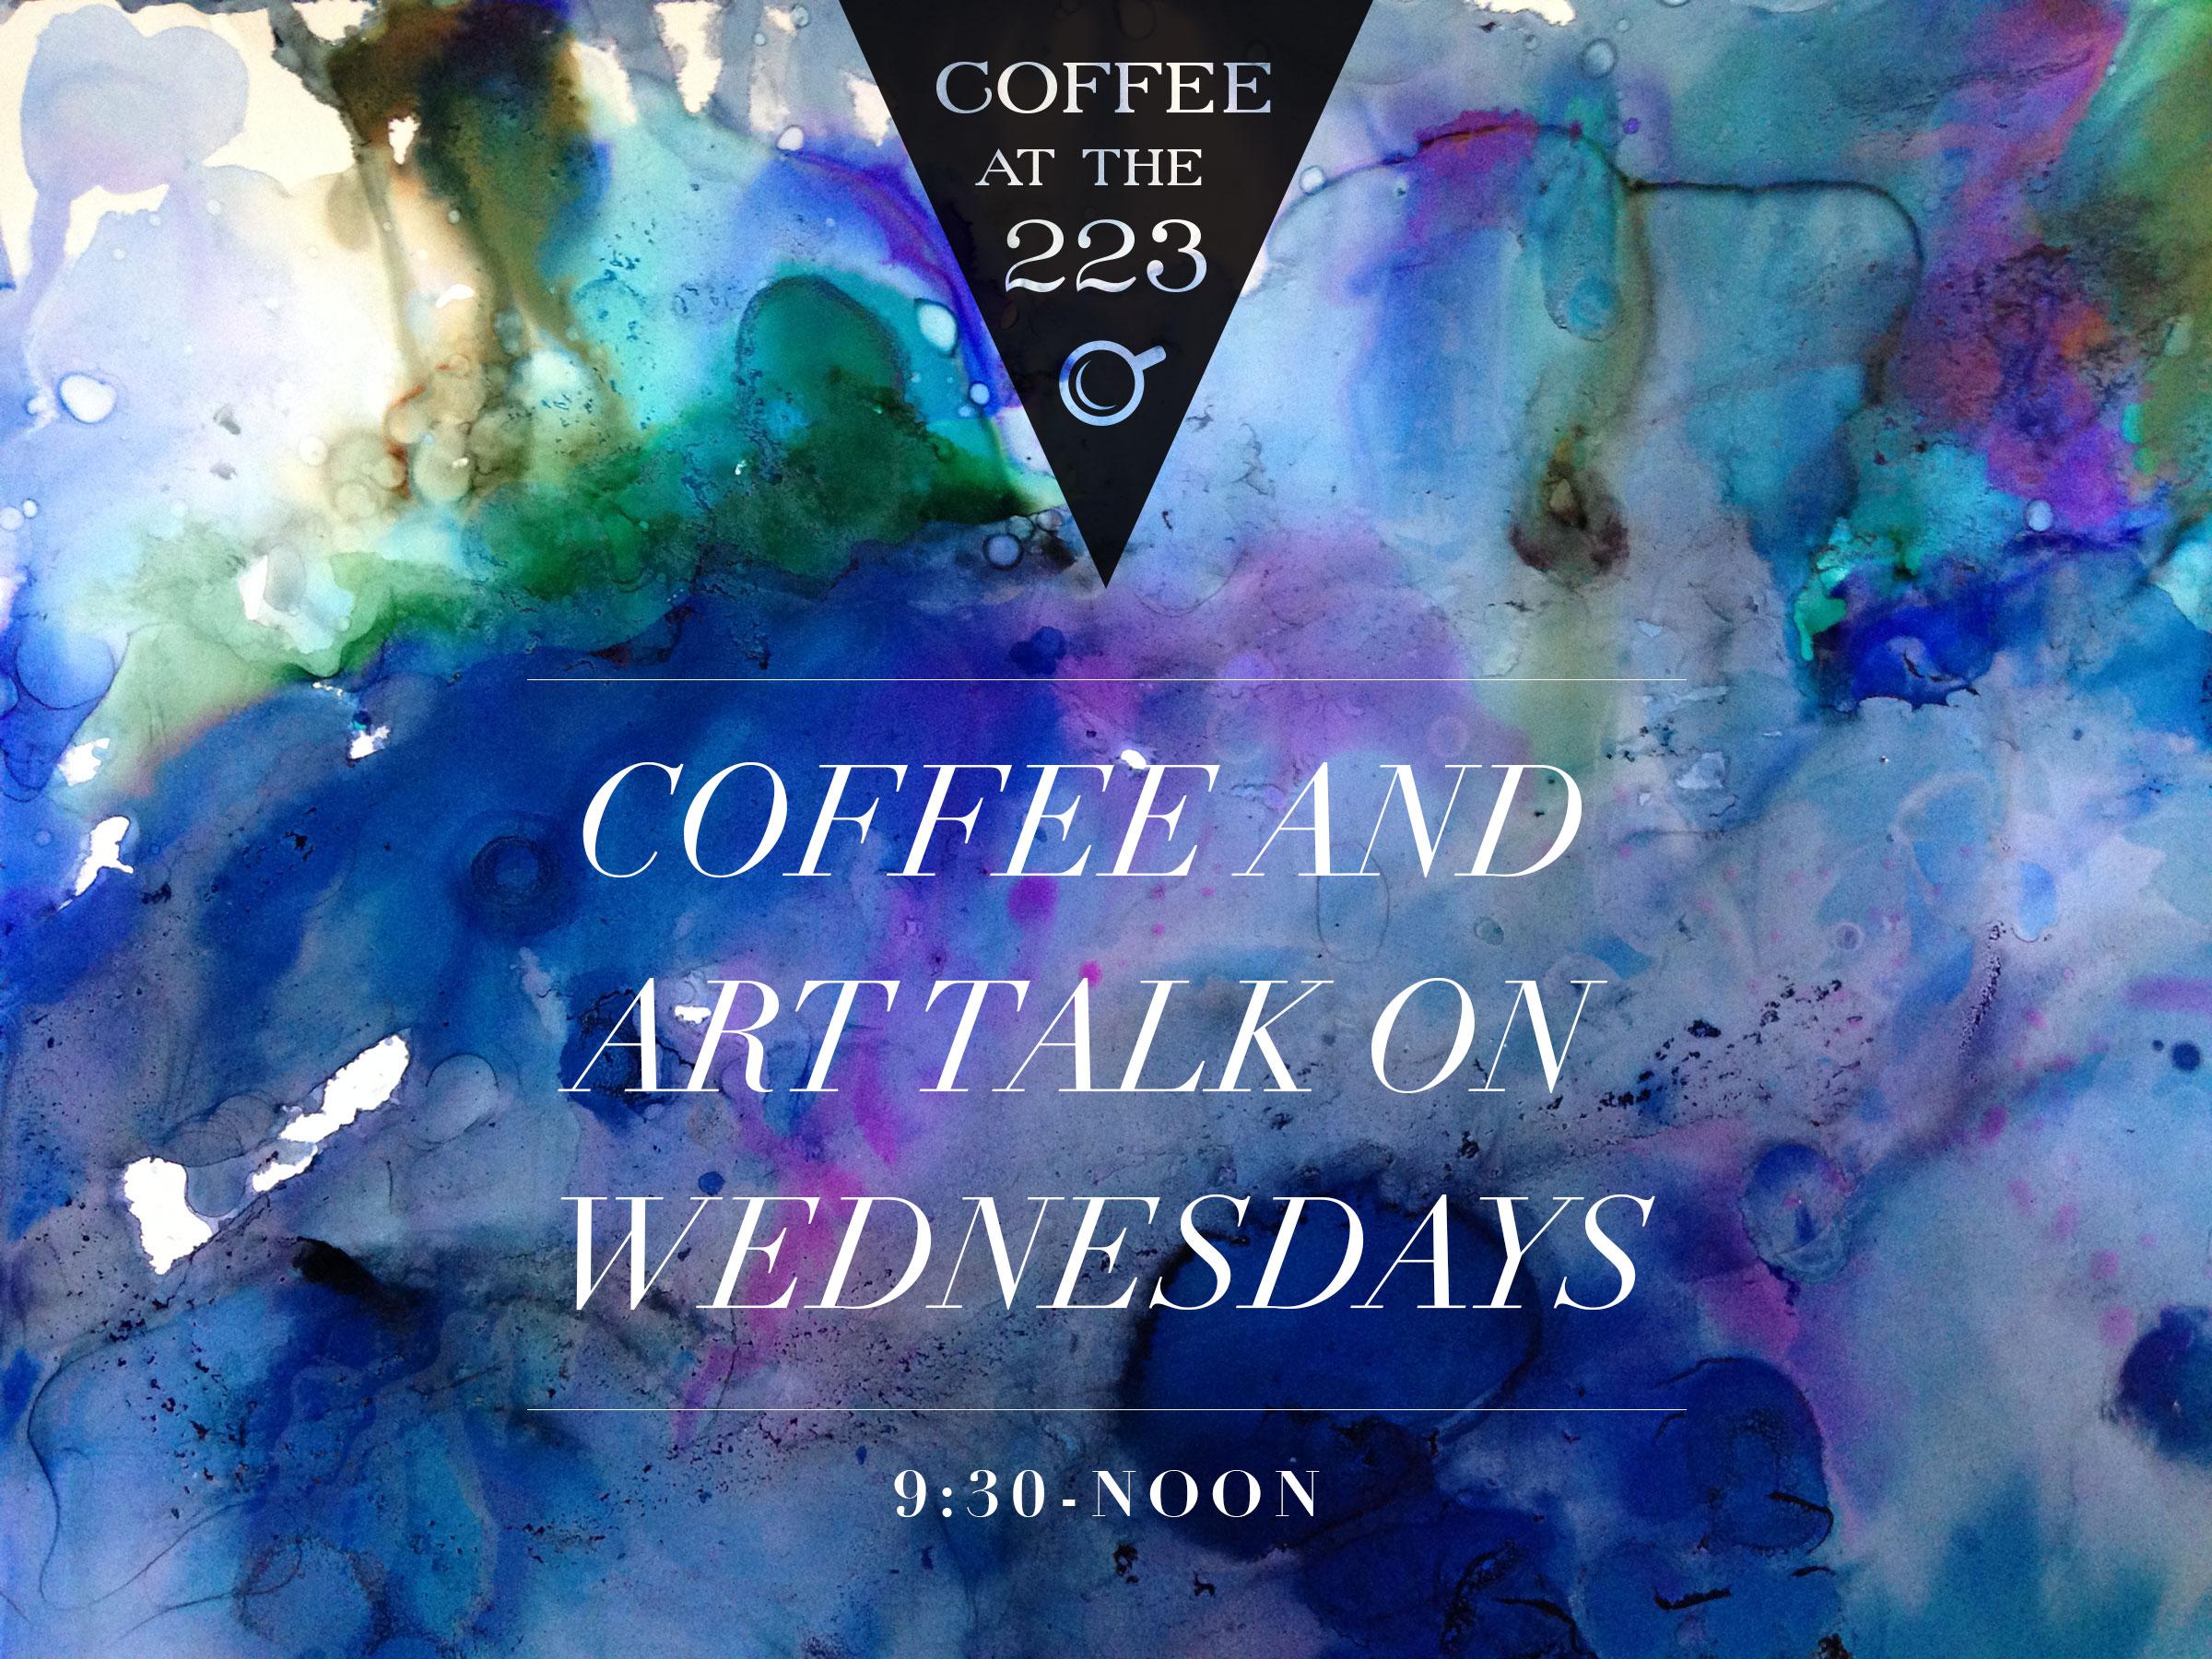 Coffee-and-art